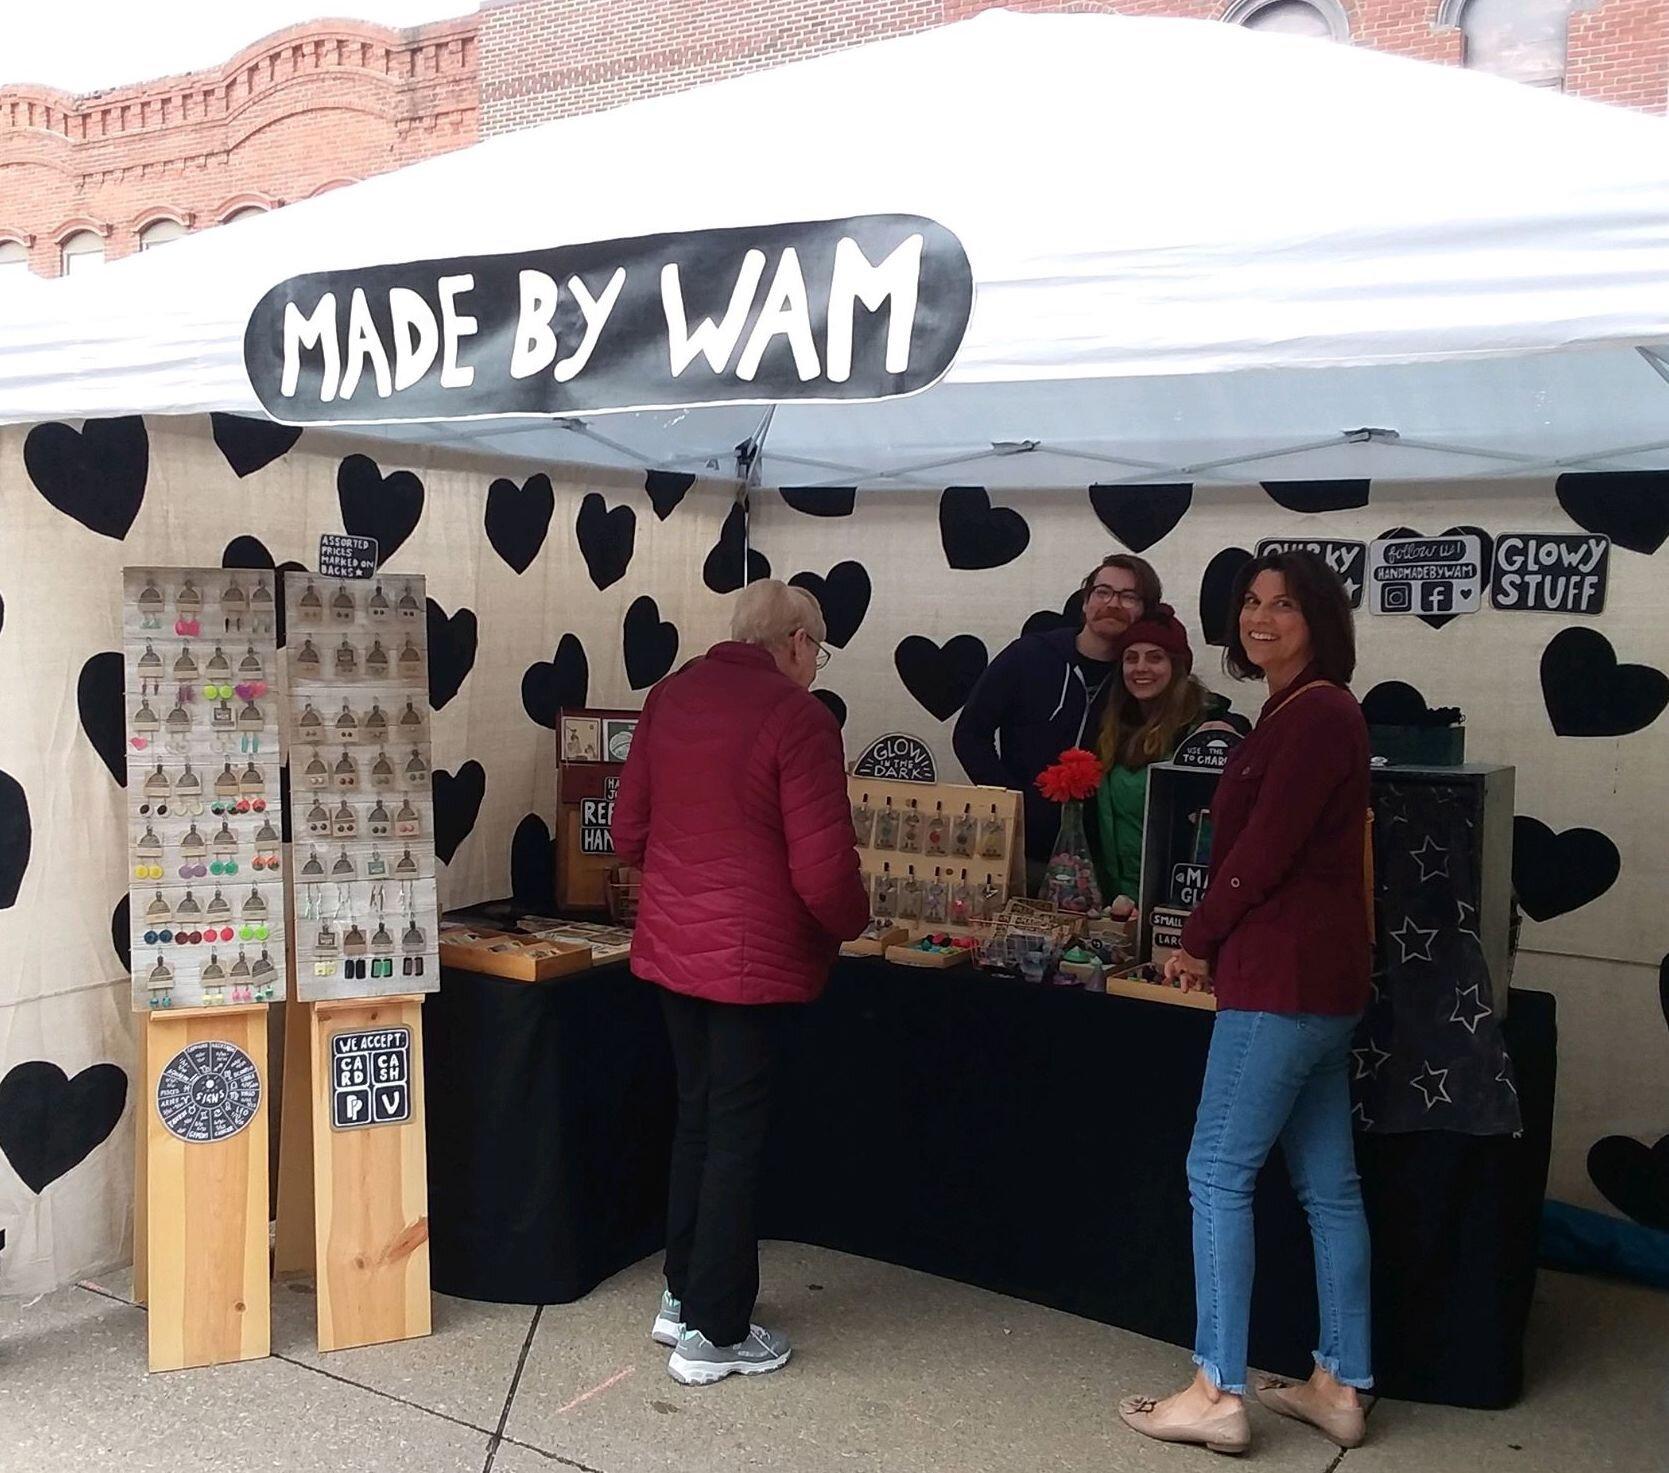 made by wam state street market 2019.jpg